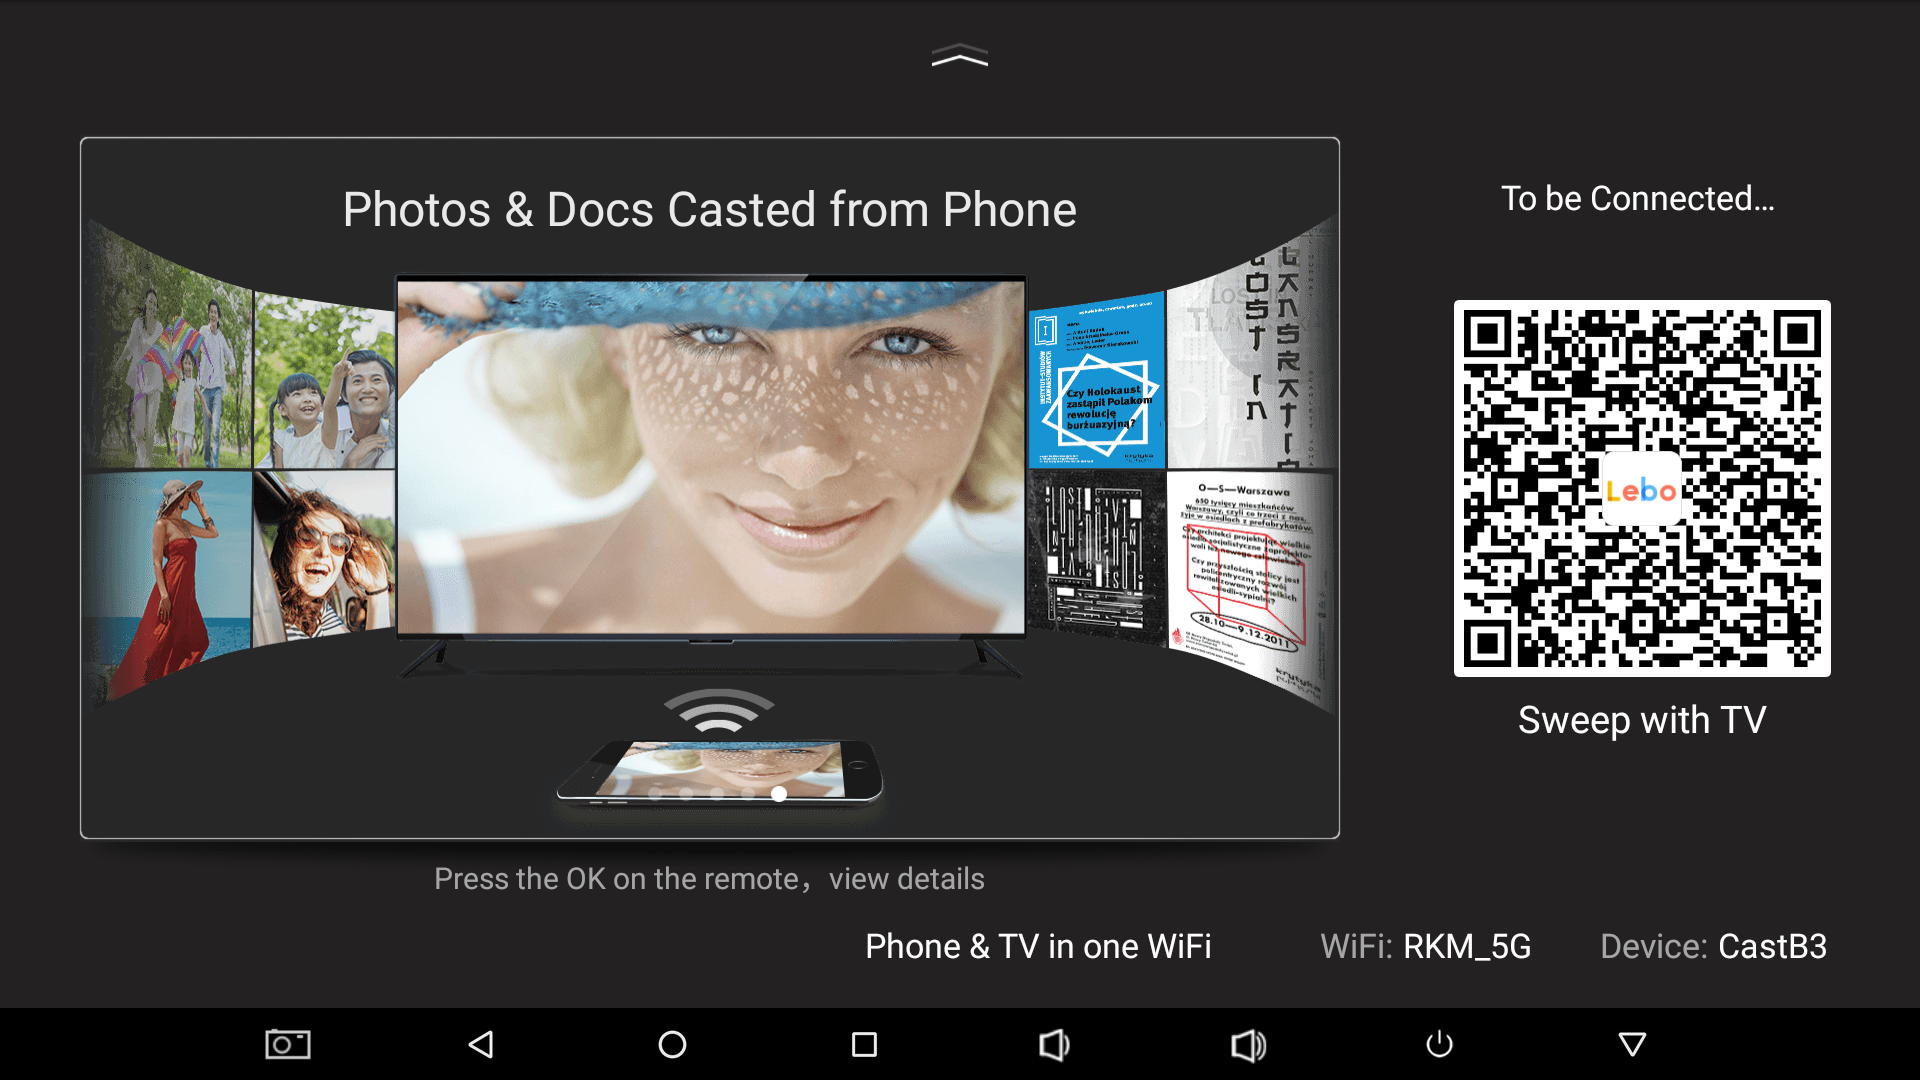 Mirror apk for amlogic device - Company News - News